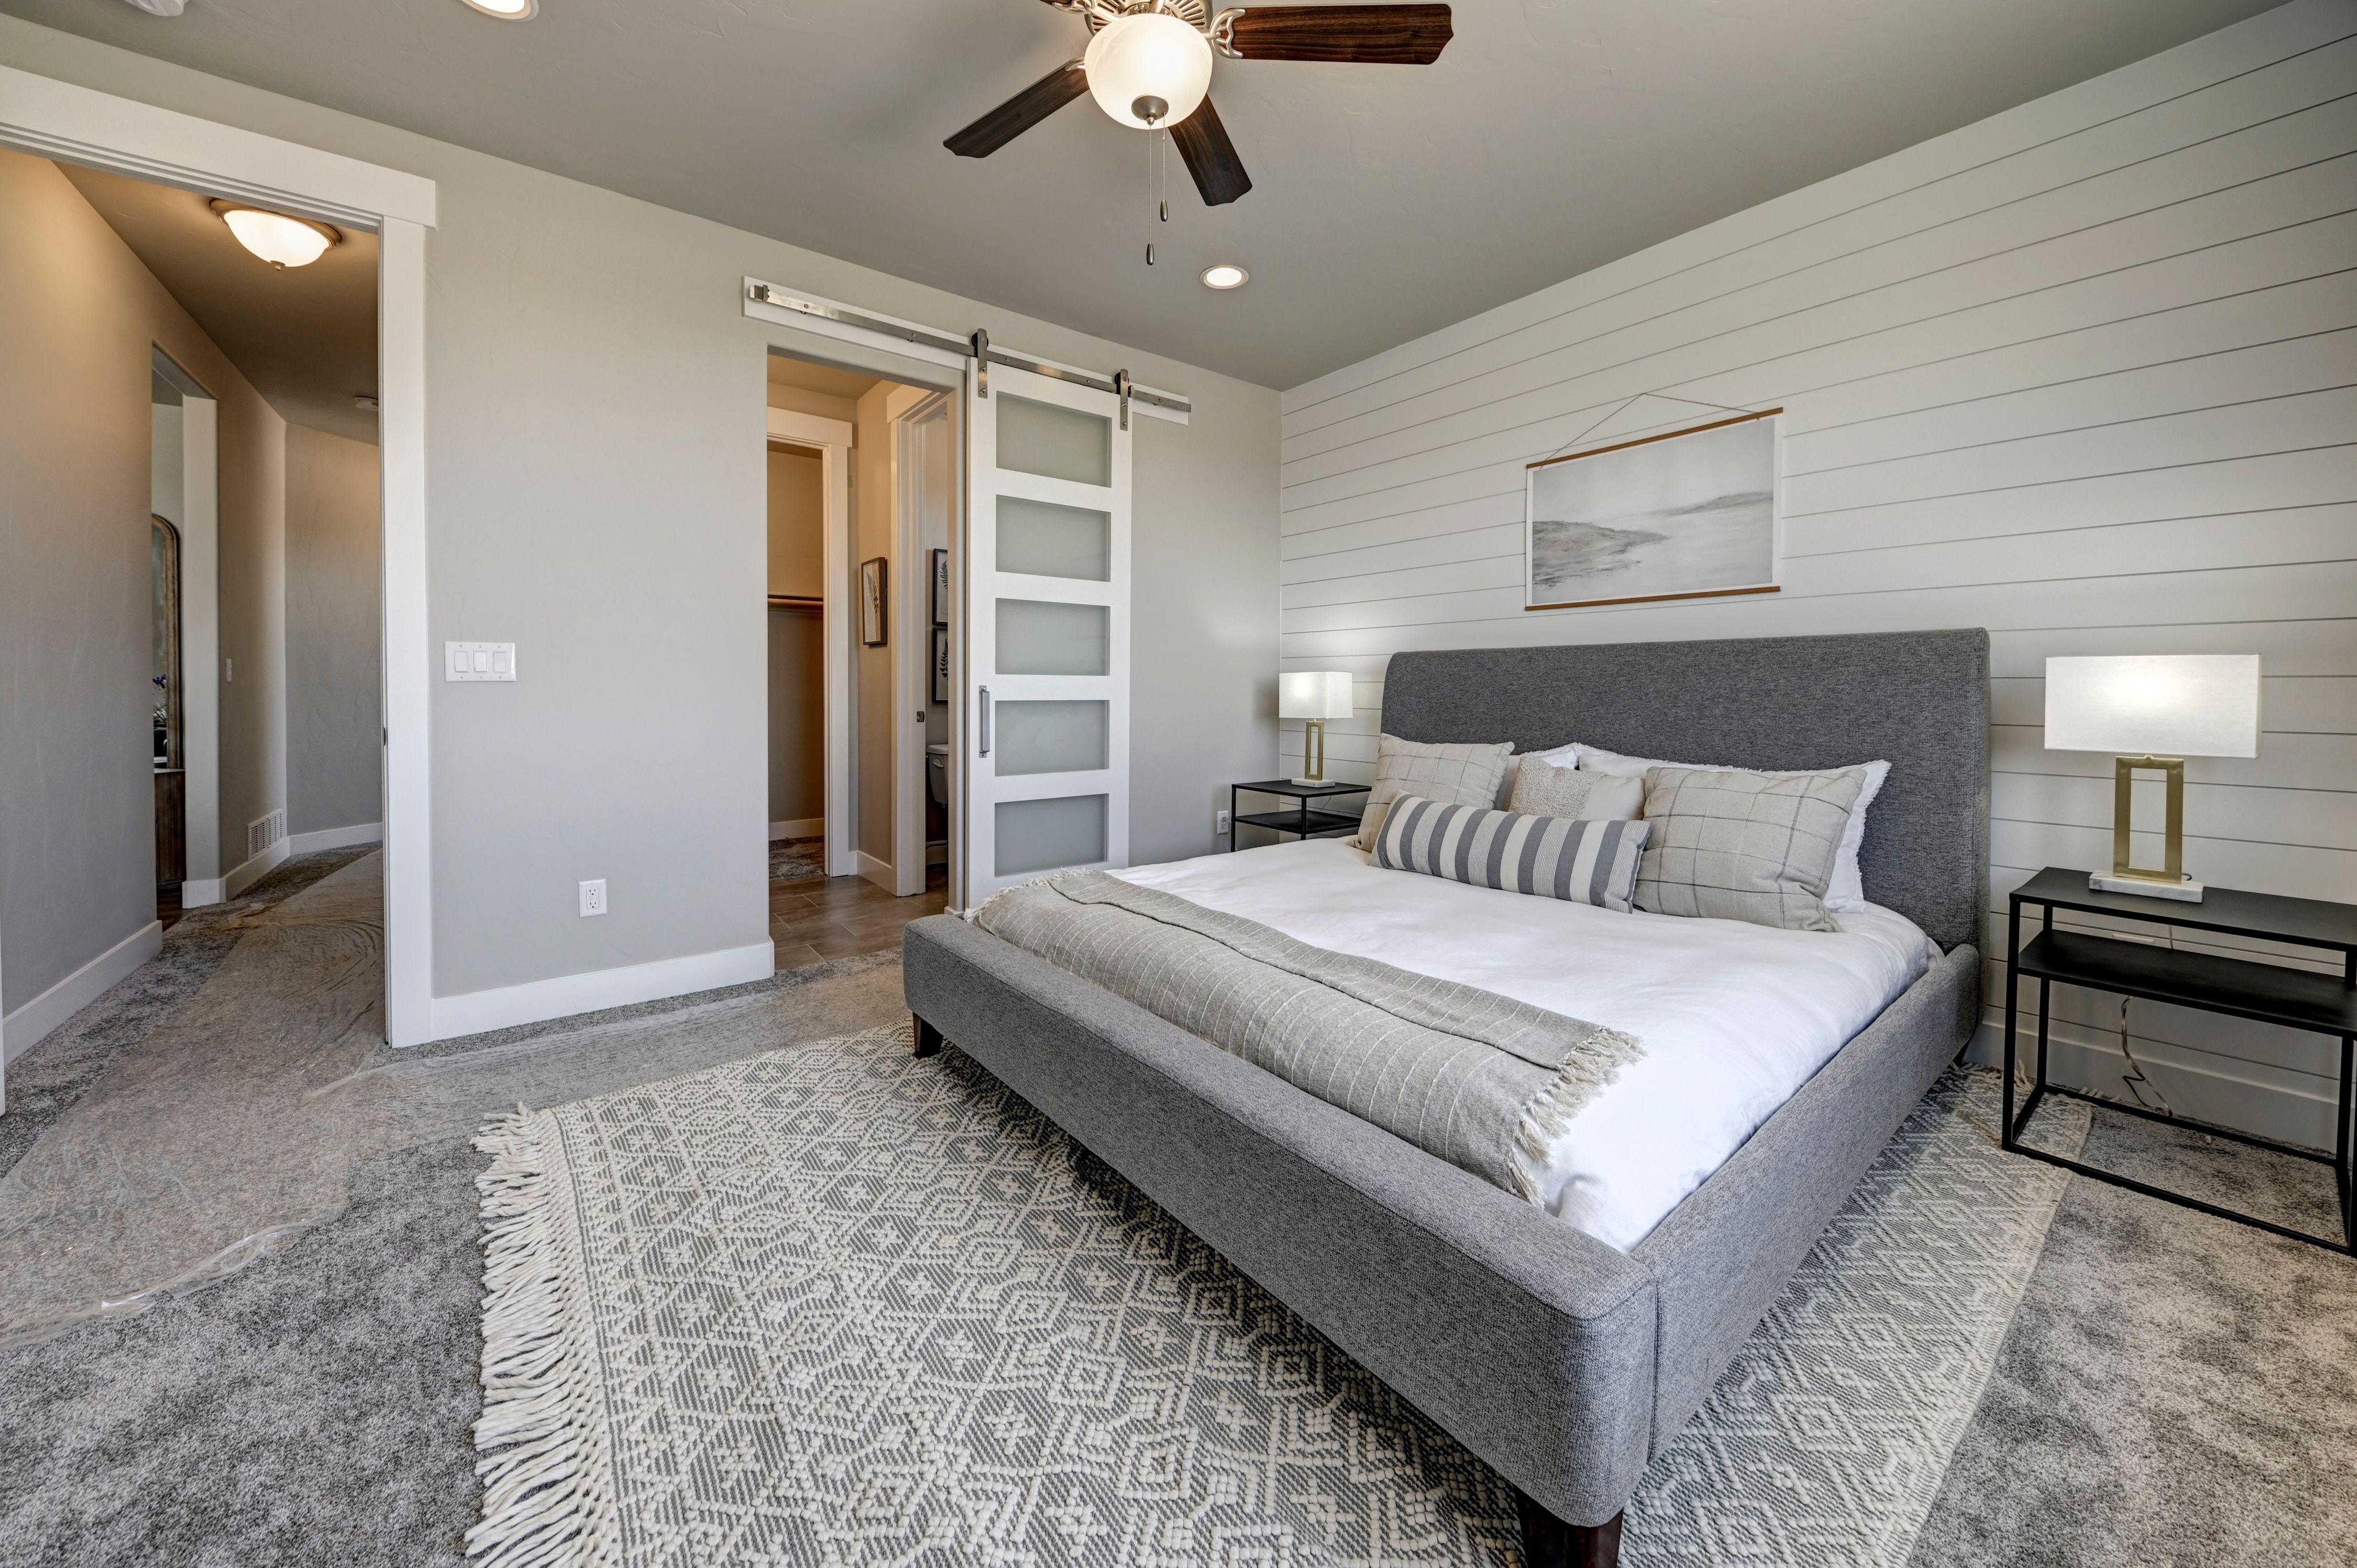 Bedroom featured in the Jones By Adamo Homes in Colorado Springs, CO